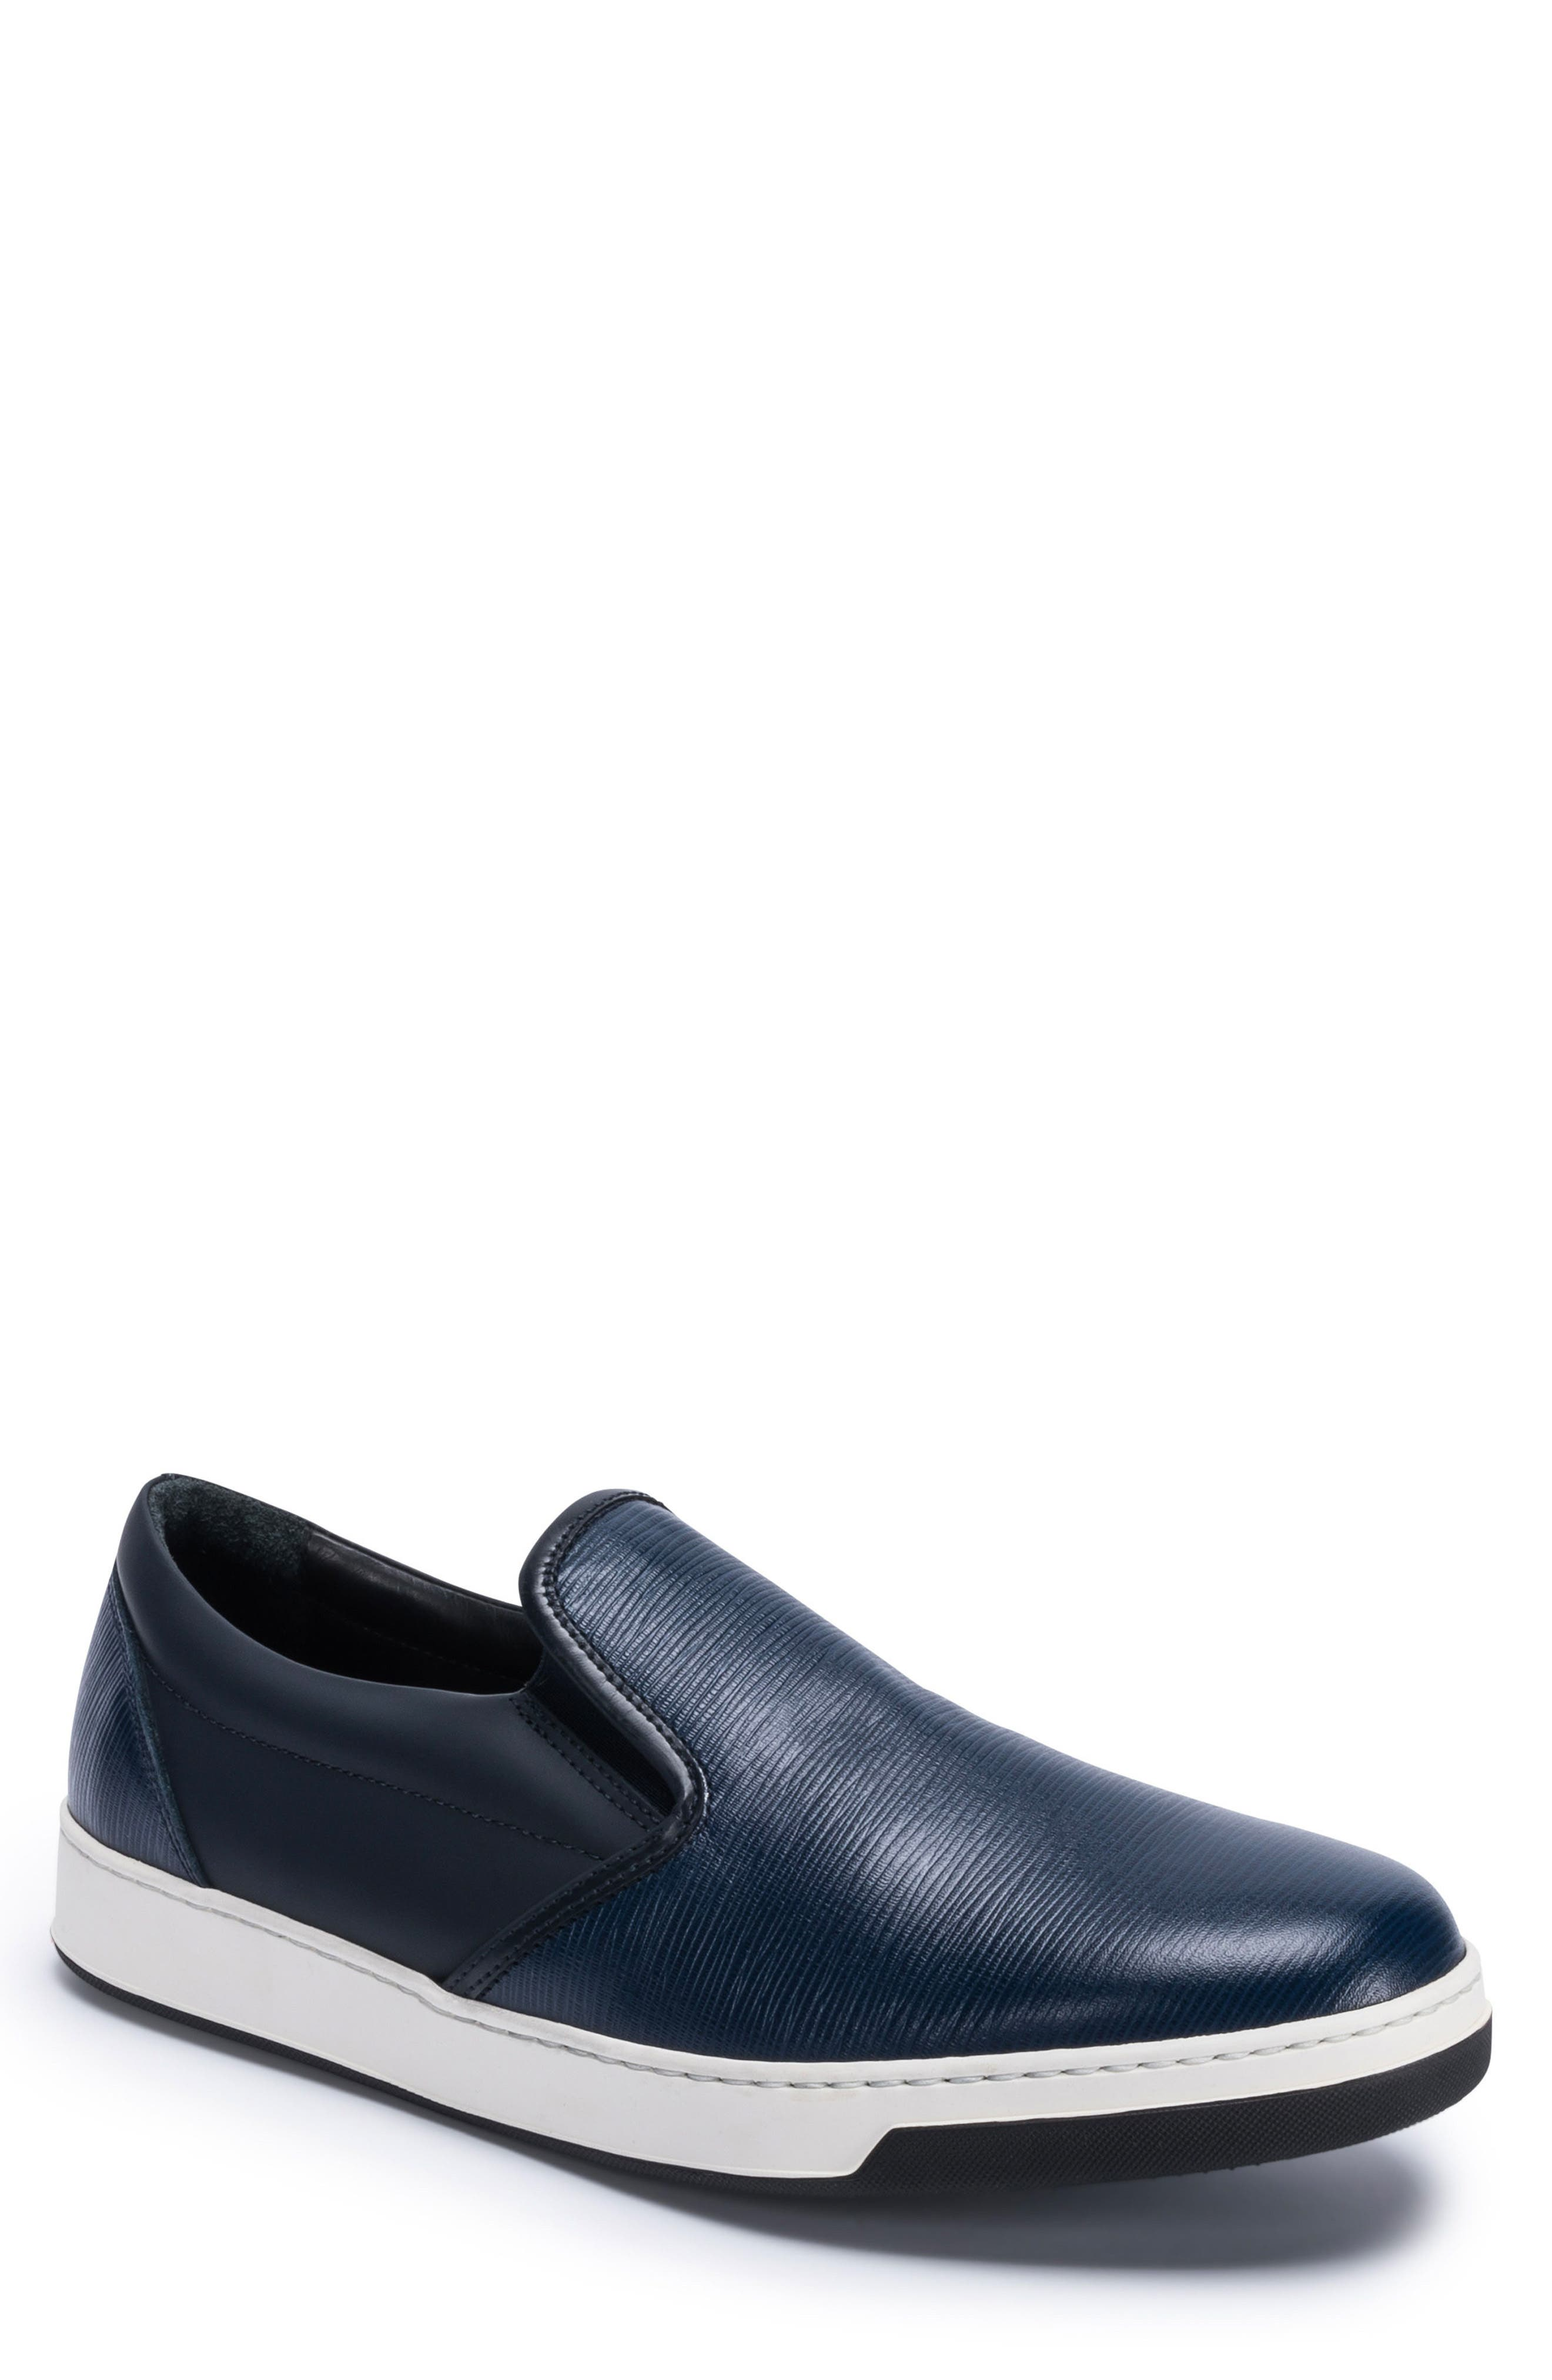 Santorini Slip-On Sneaker,                             Main thumbnail 2, color,